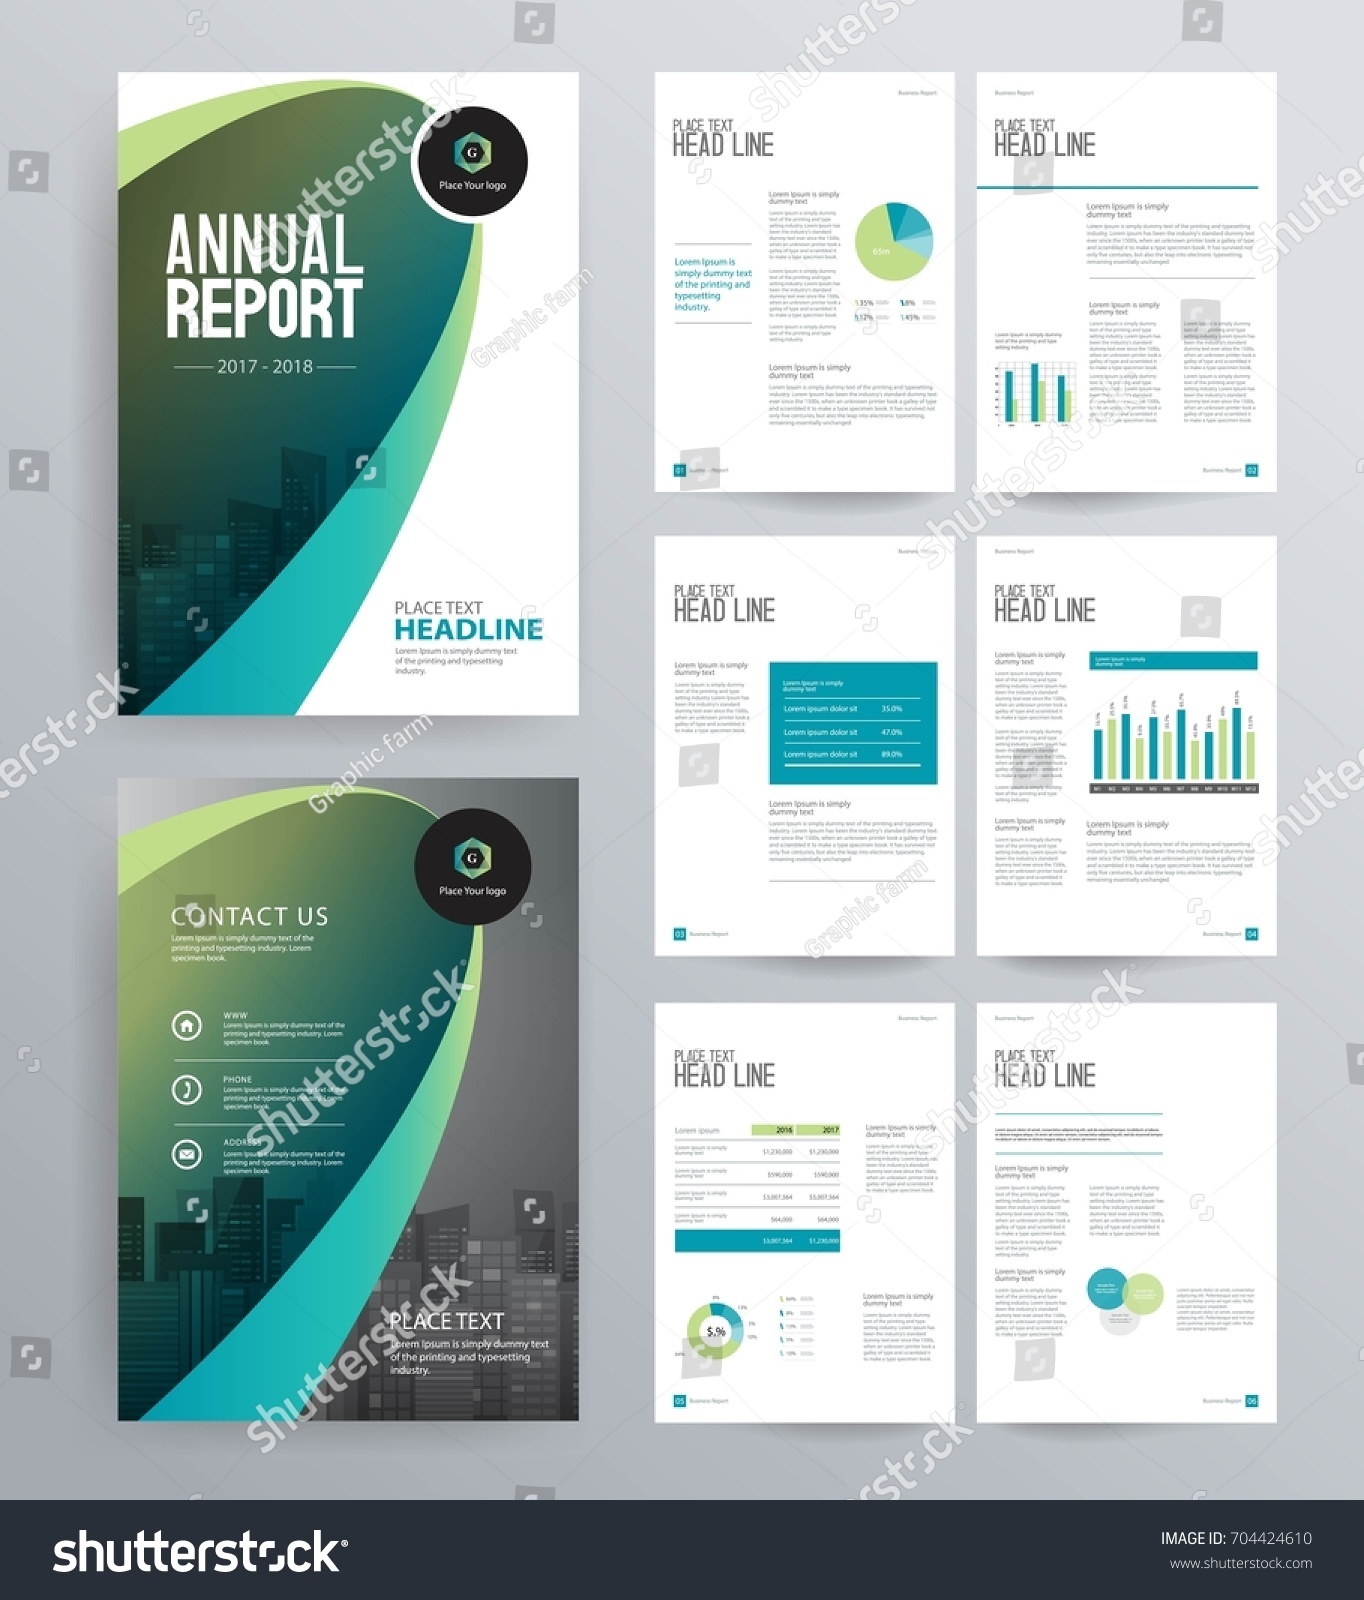 Template design company profile annual report stock vector for Security company profile template